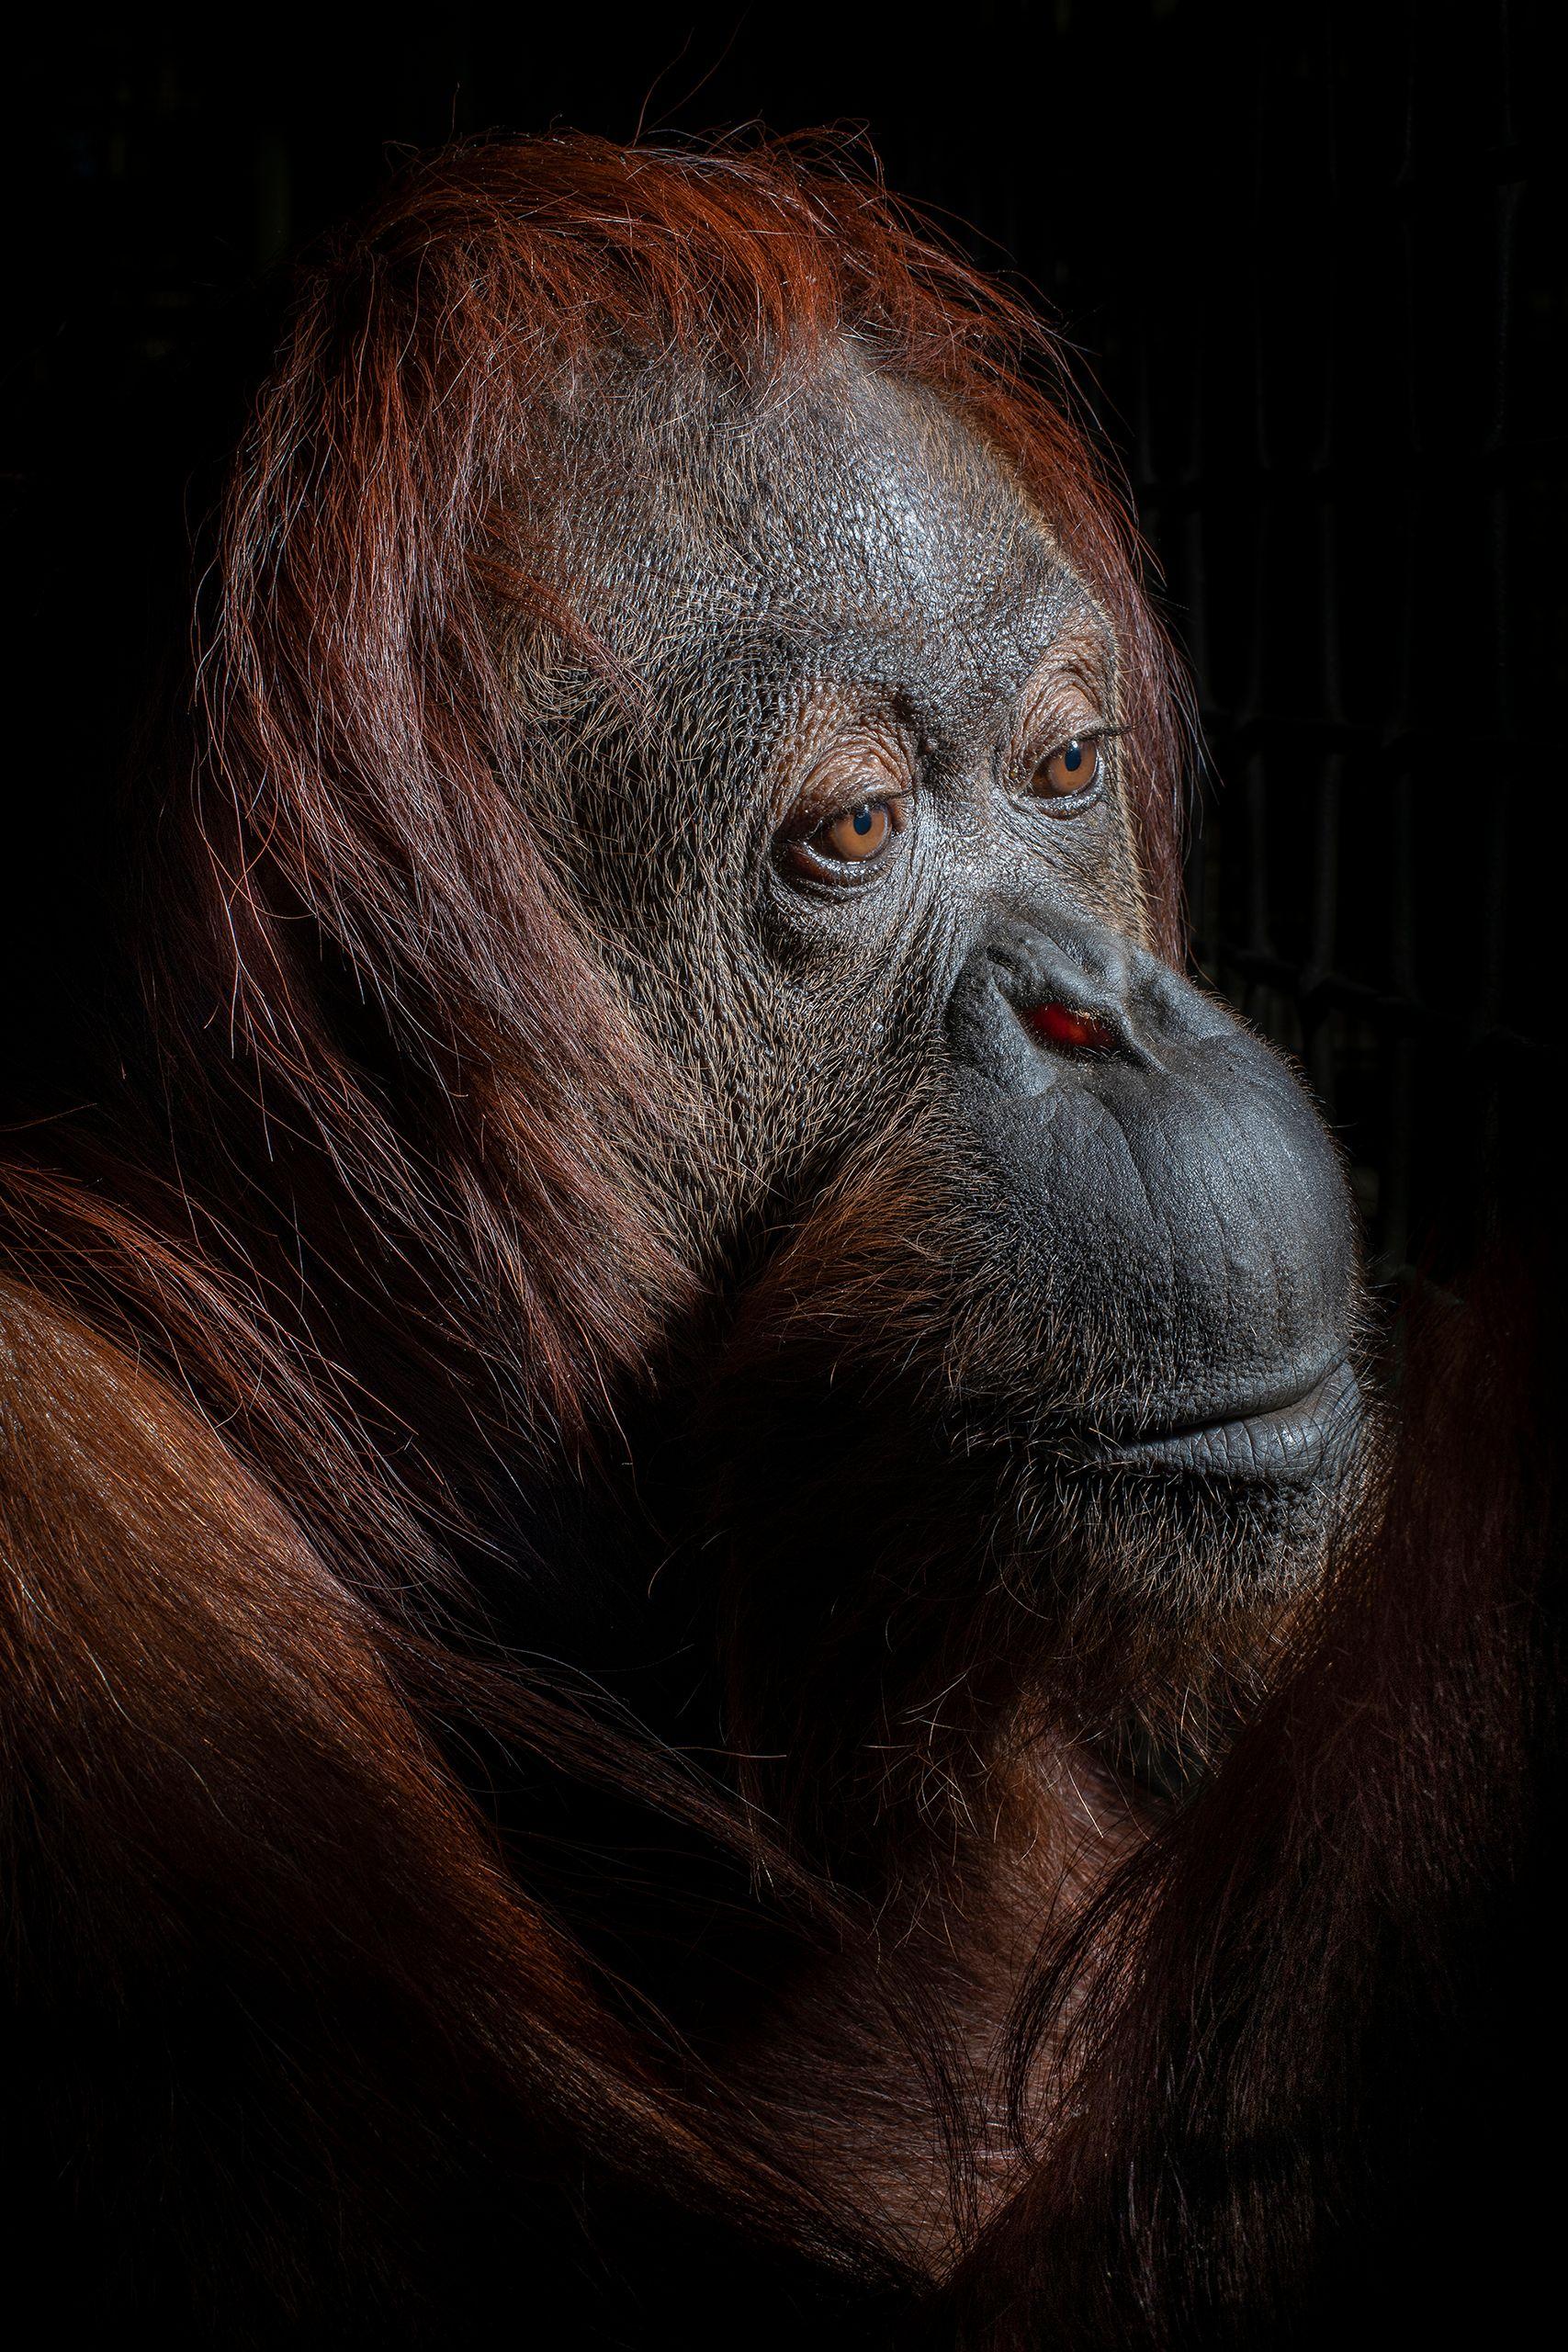 USA_FL_Center_Great_Apes_Sandra_6337_WEB.jpg